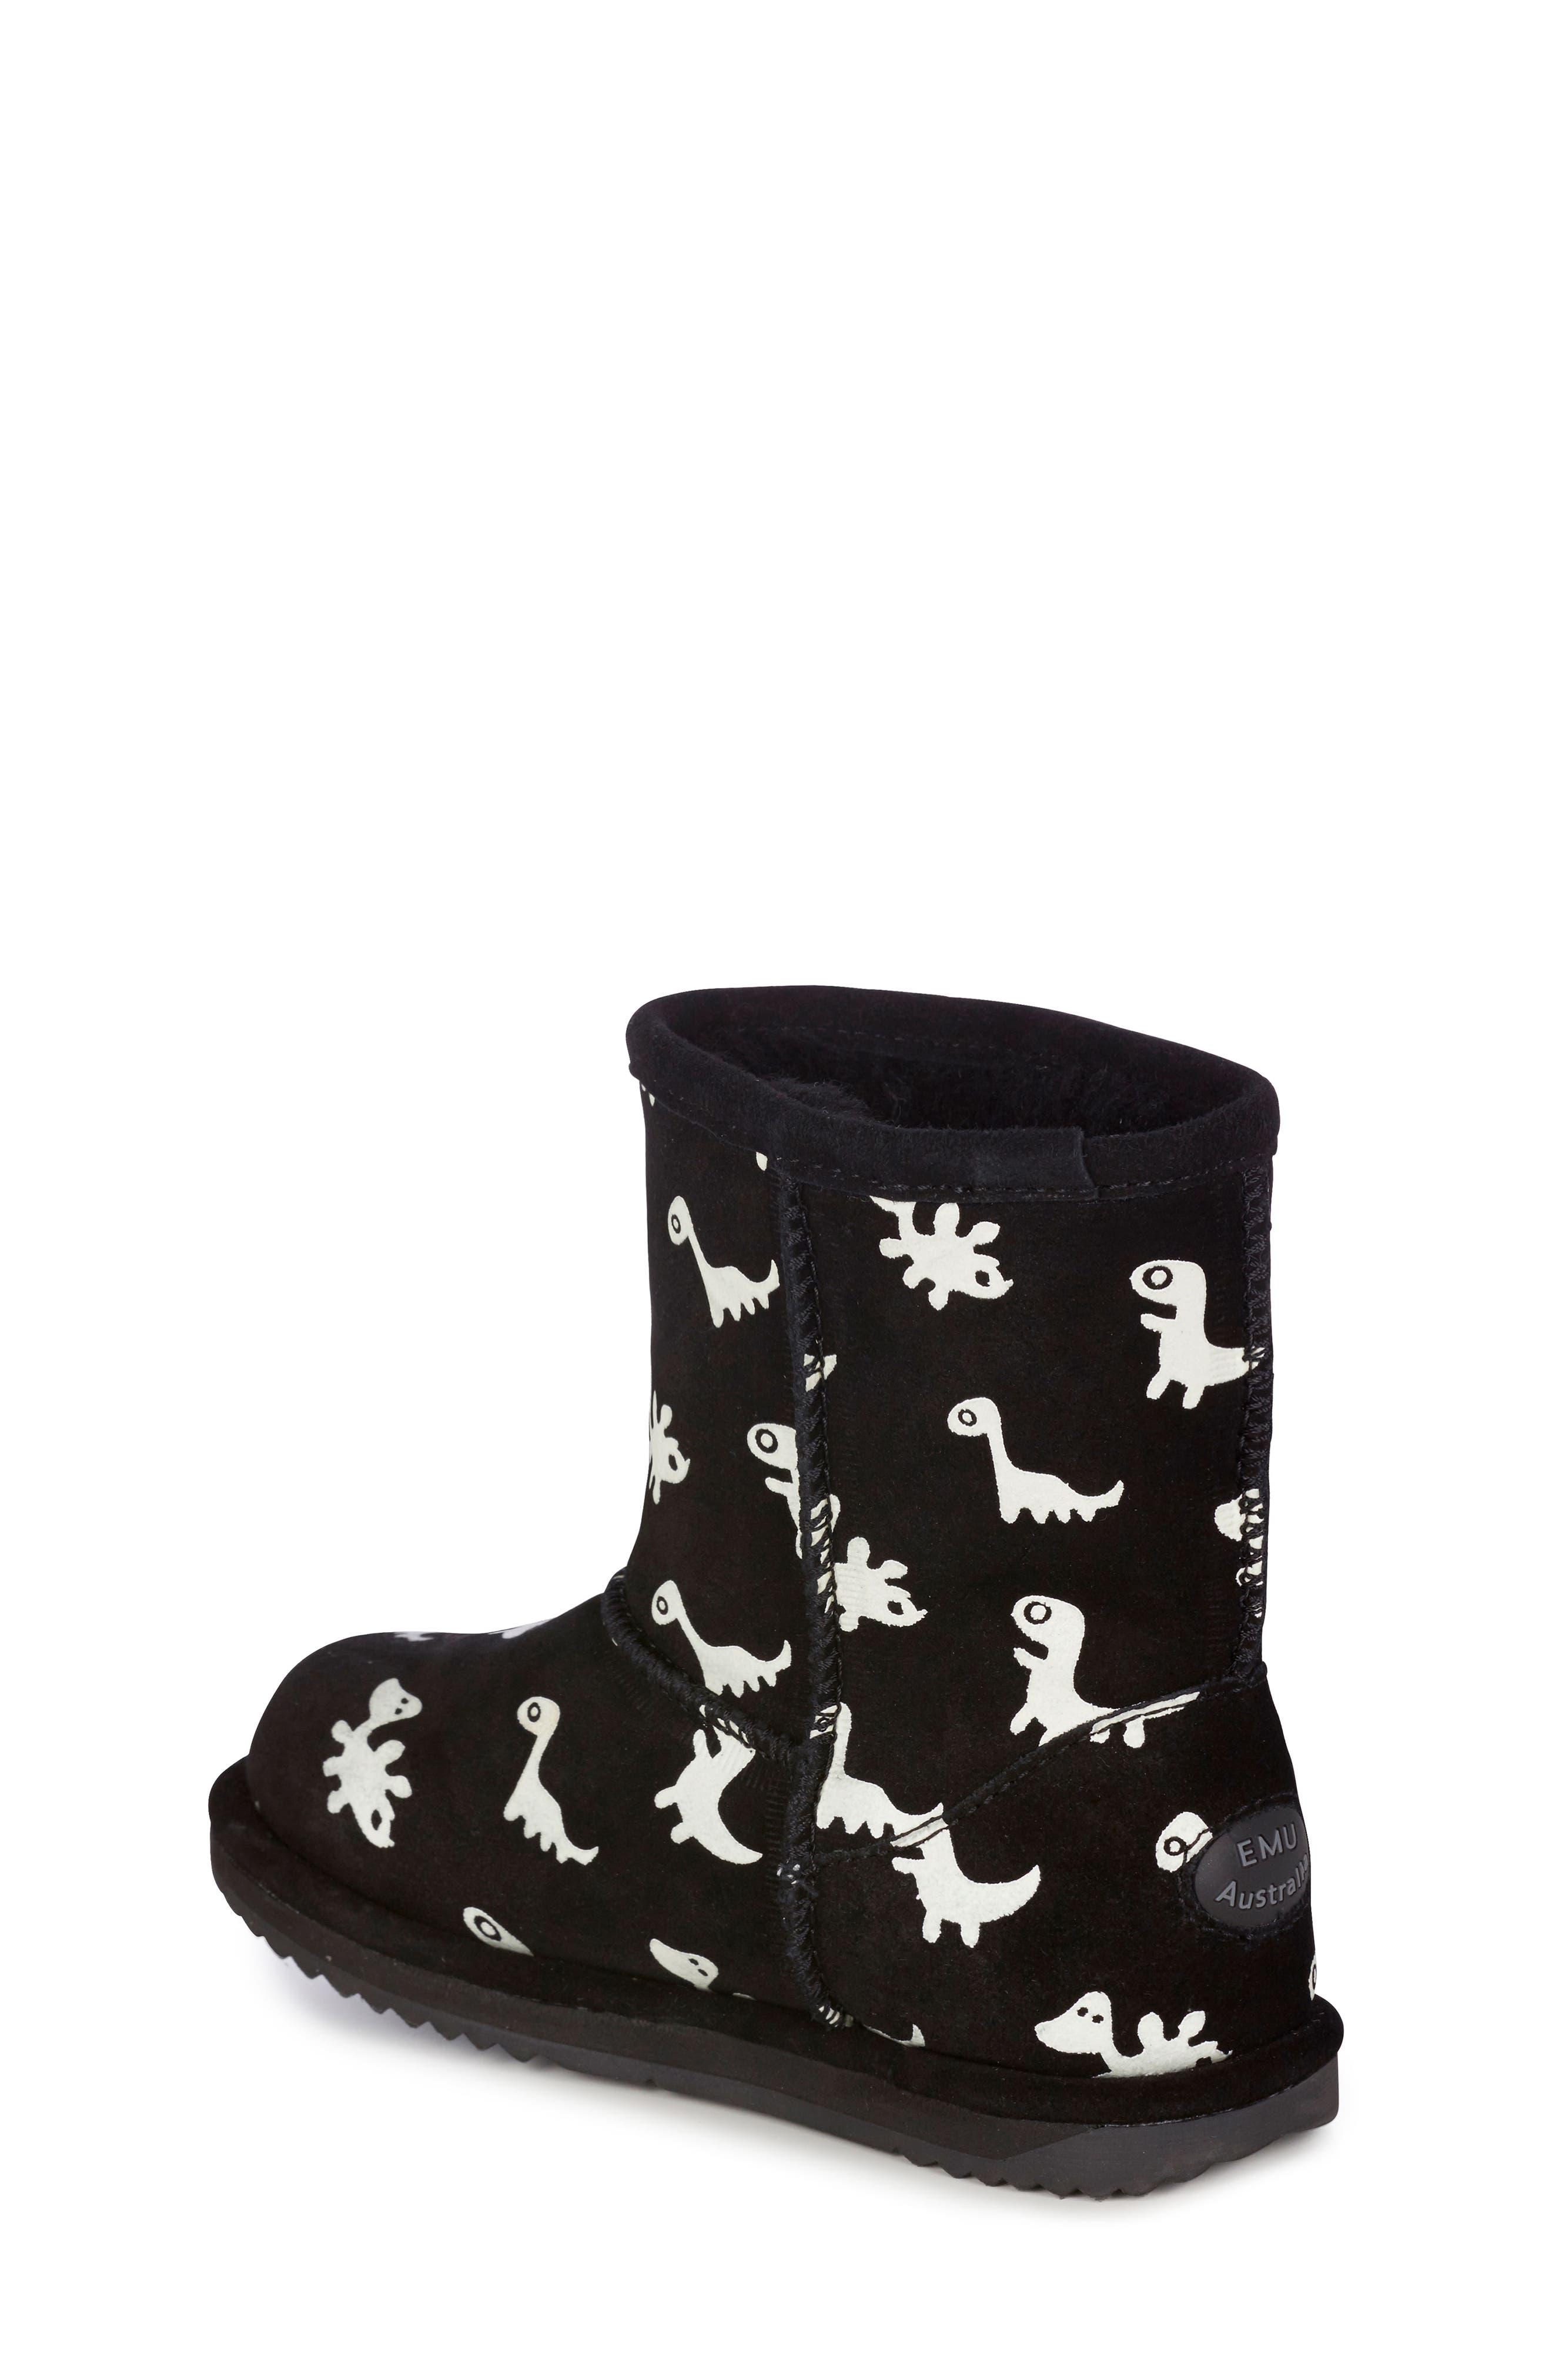 Animal Print Boots,                             Alternate thumbnail 2, color,                             BLACK